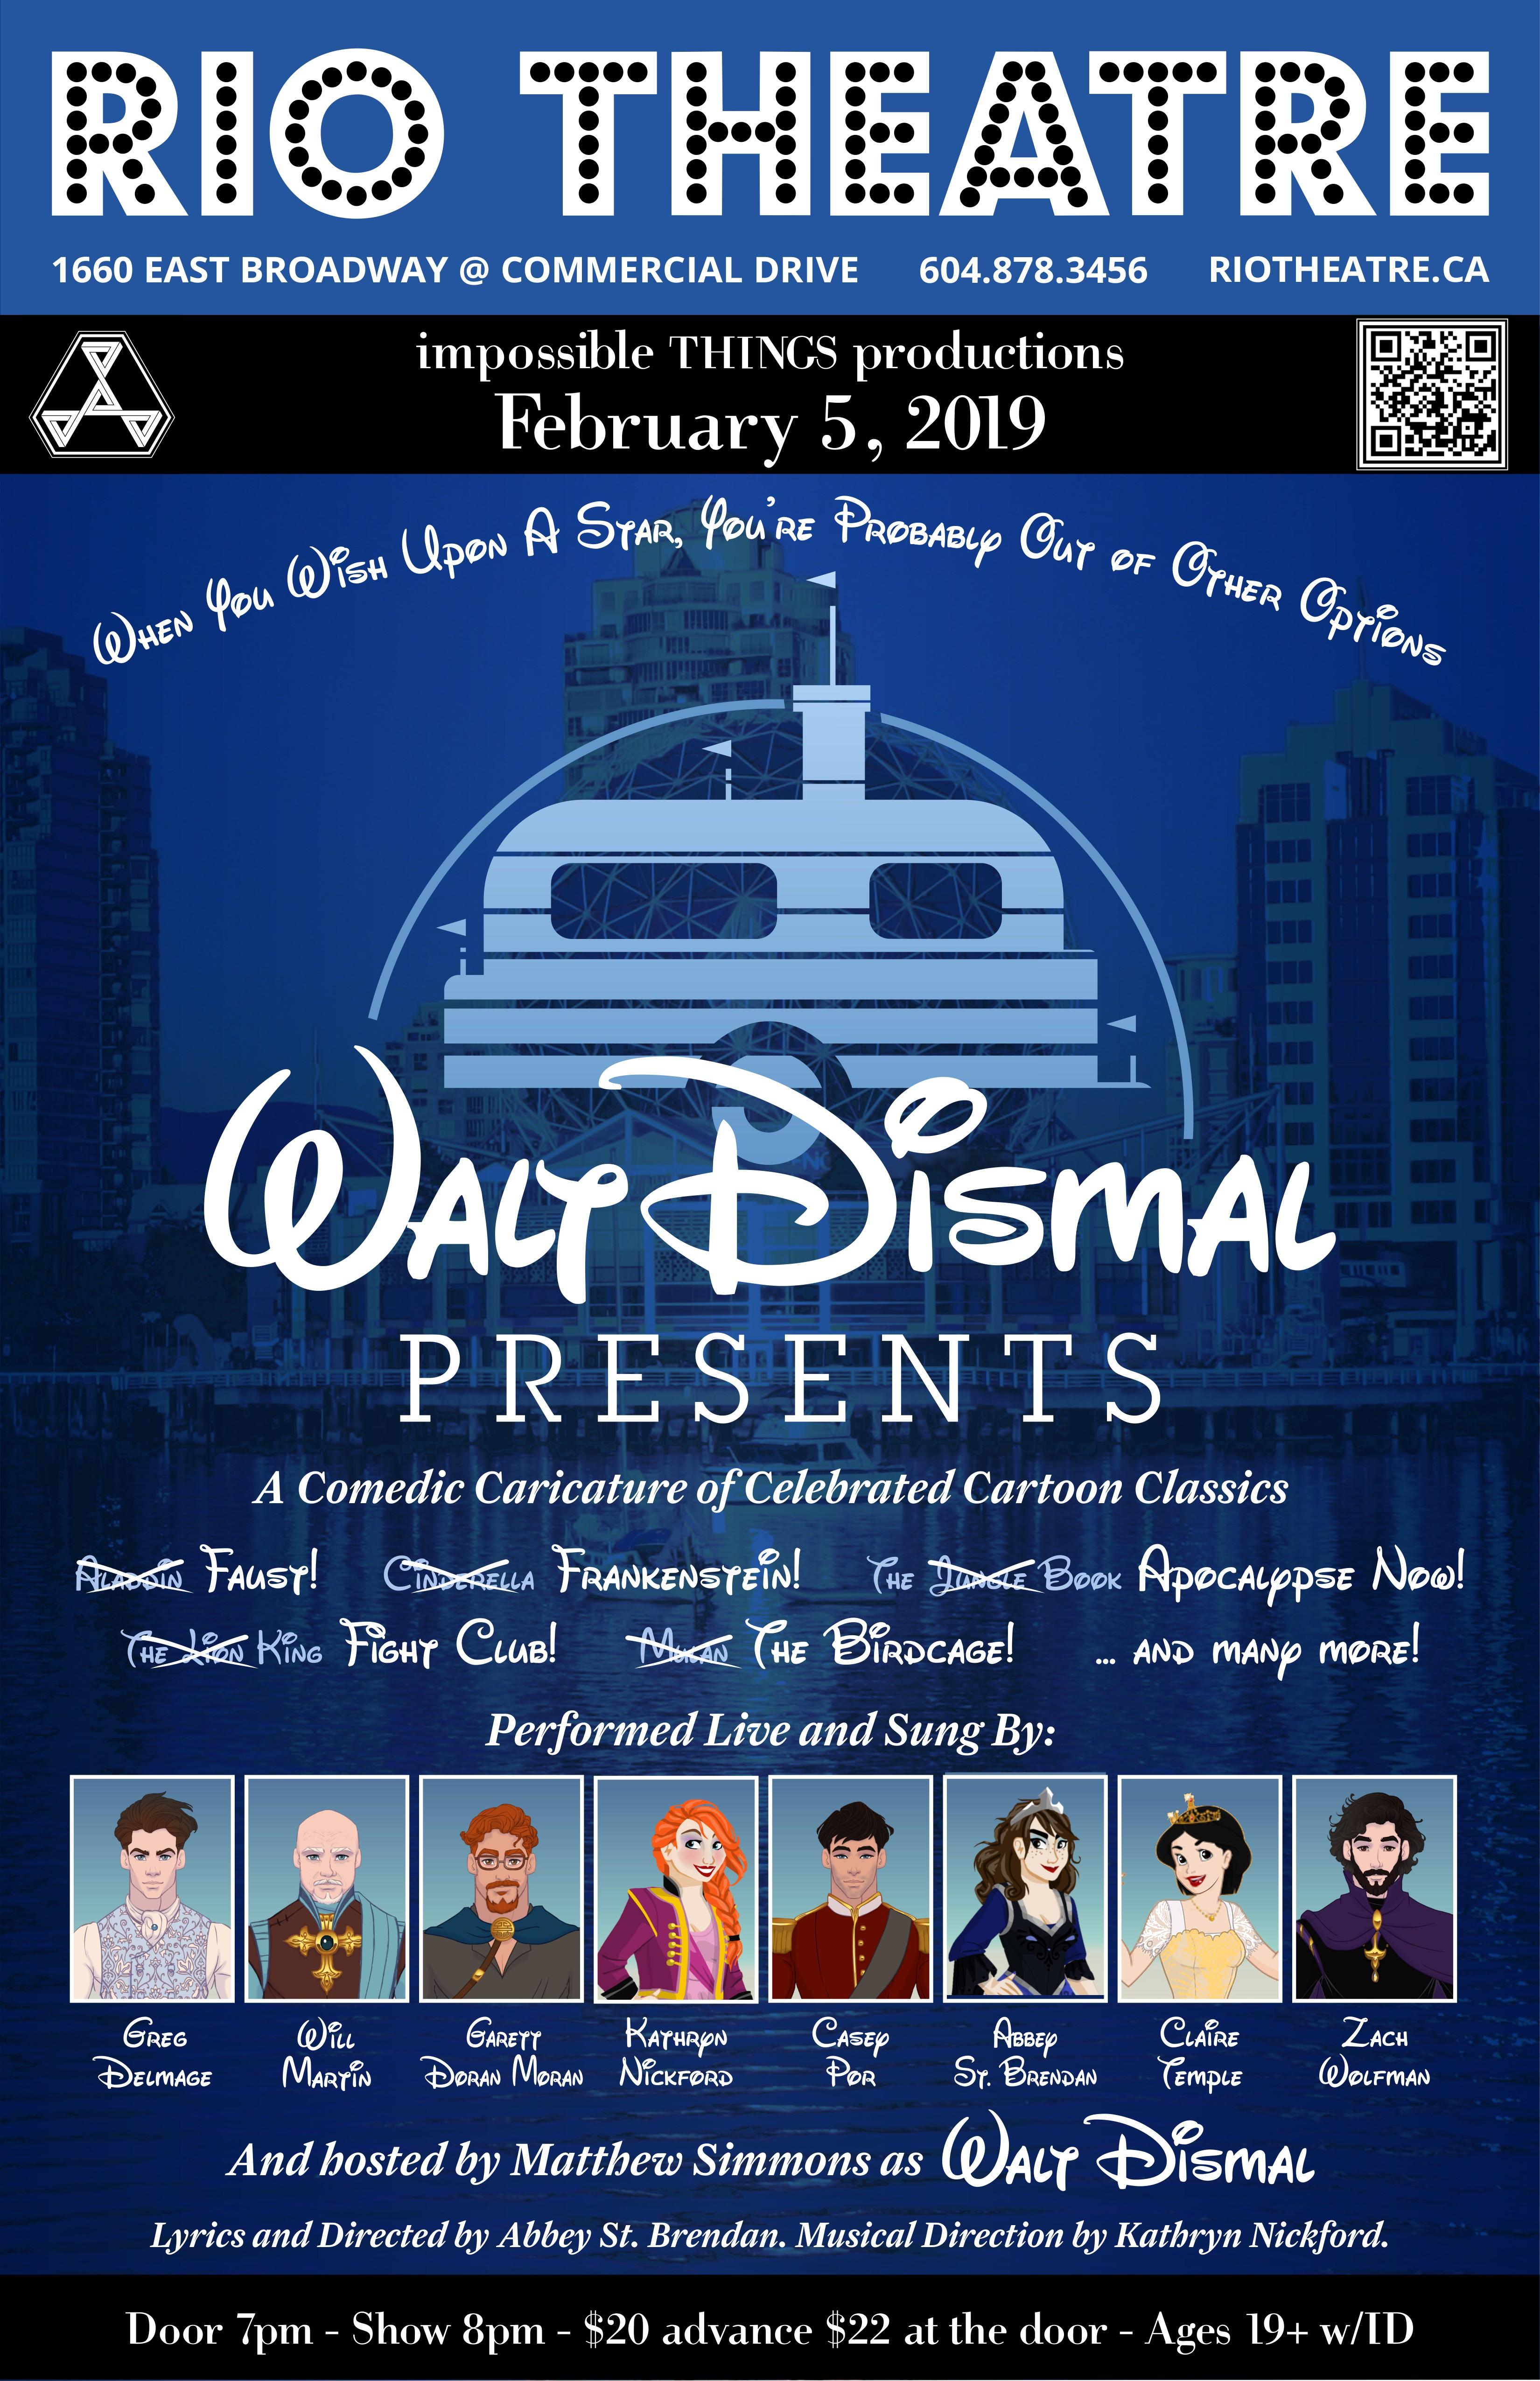 Walt Dismal Presents